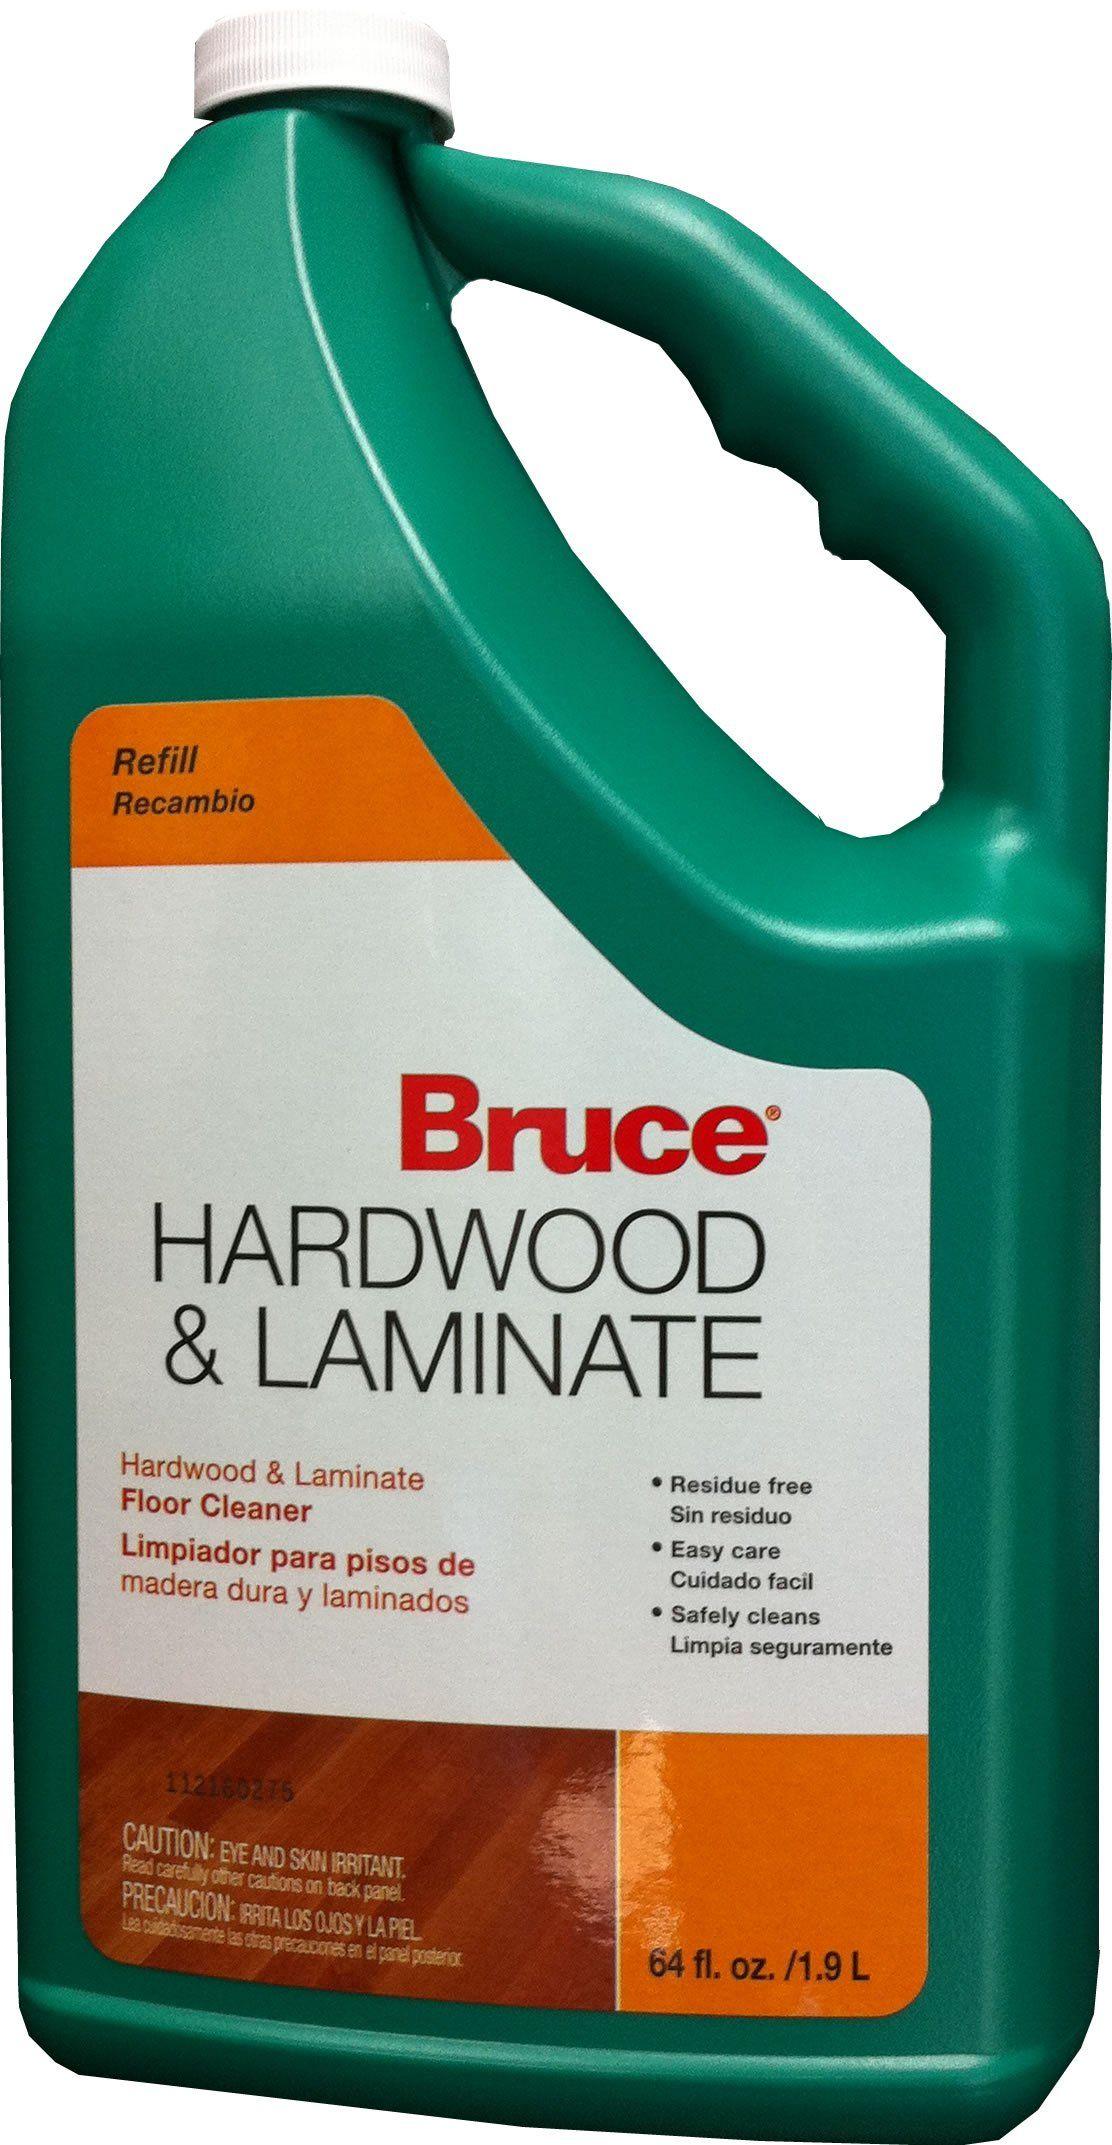 Bruce Laminate And Hardwood Floor Cleaner Floor Cleaner Wood Floor Cleaner Laminate Flooring